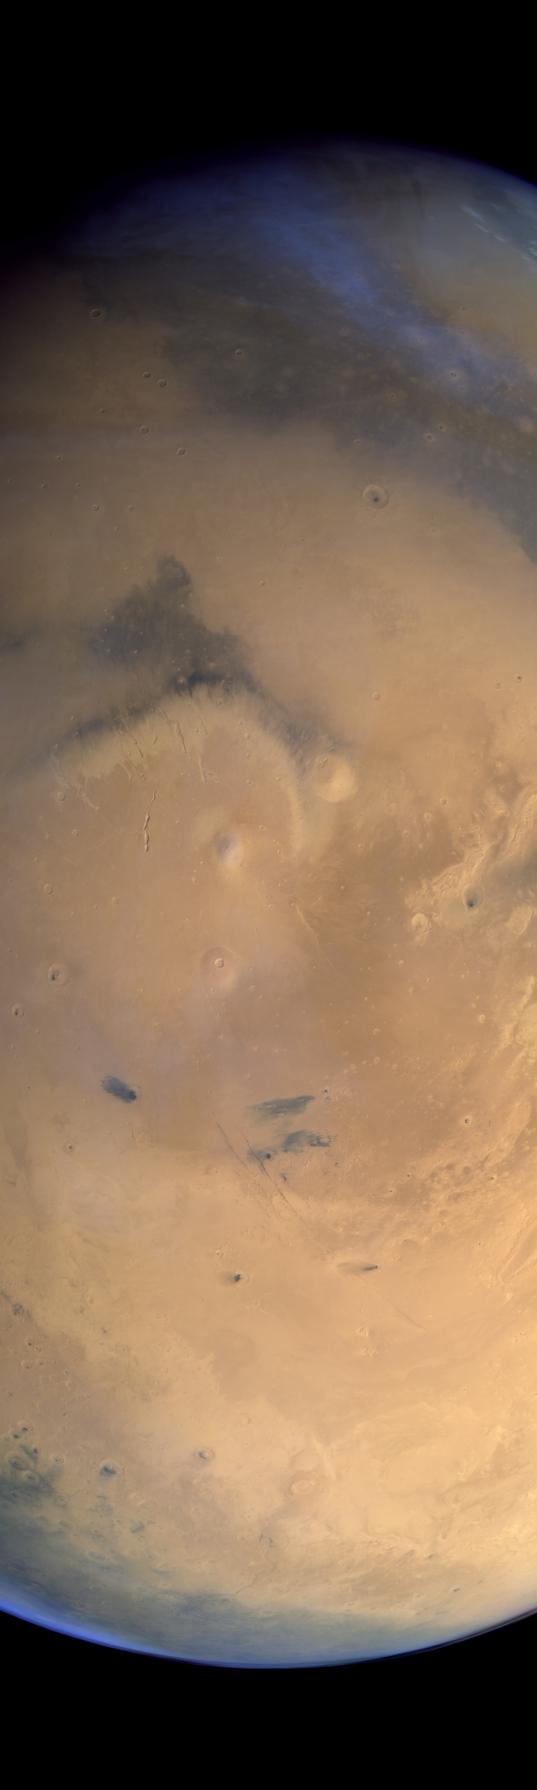 Elysium and environs, Mars